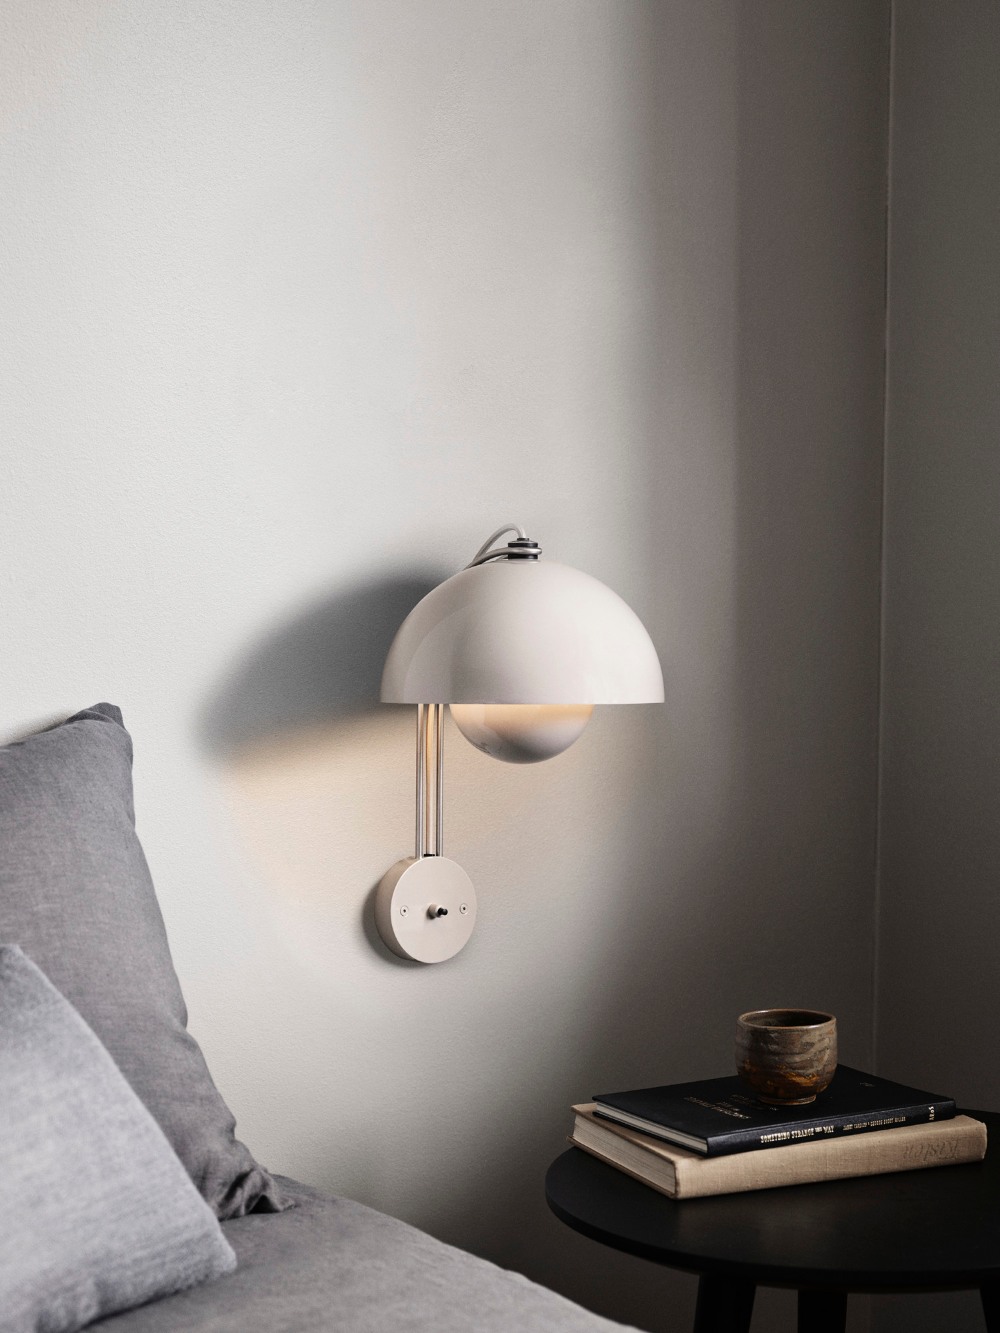 Tradition Flowerpot Vp8 In 2020 Verner Panton Designs Design Stainless Steel Lamps